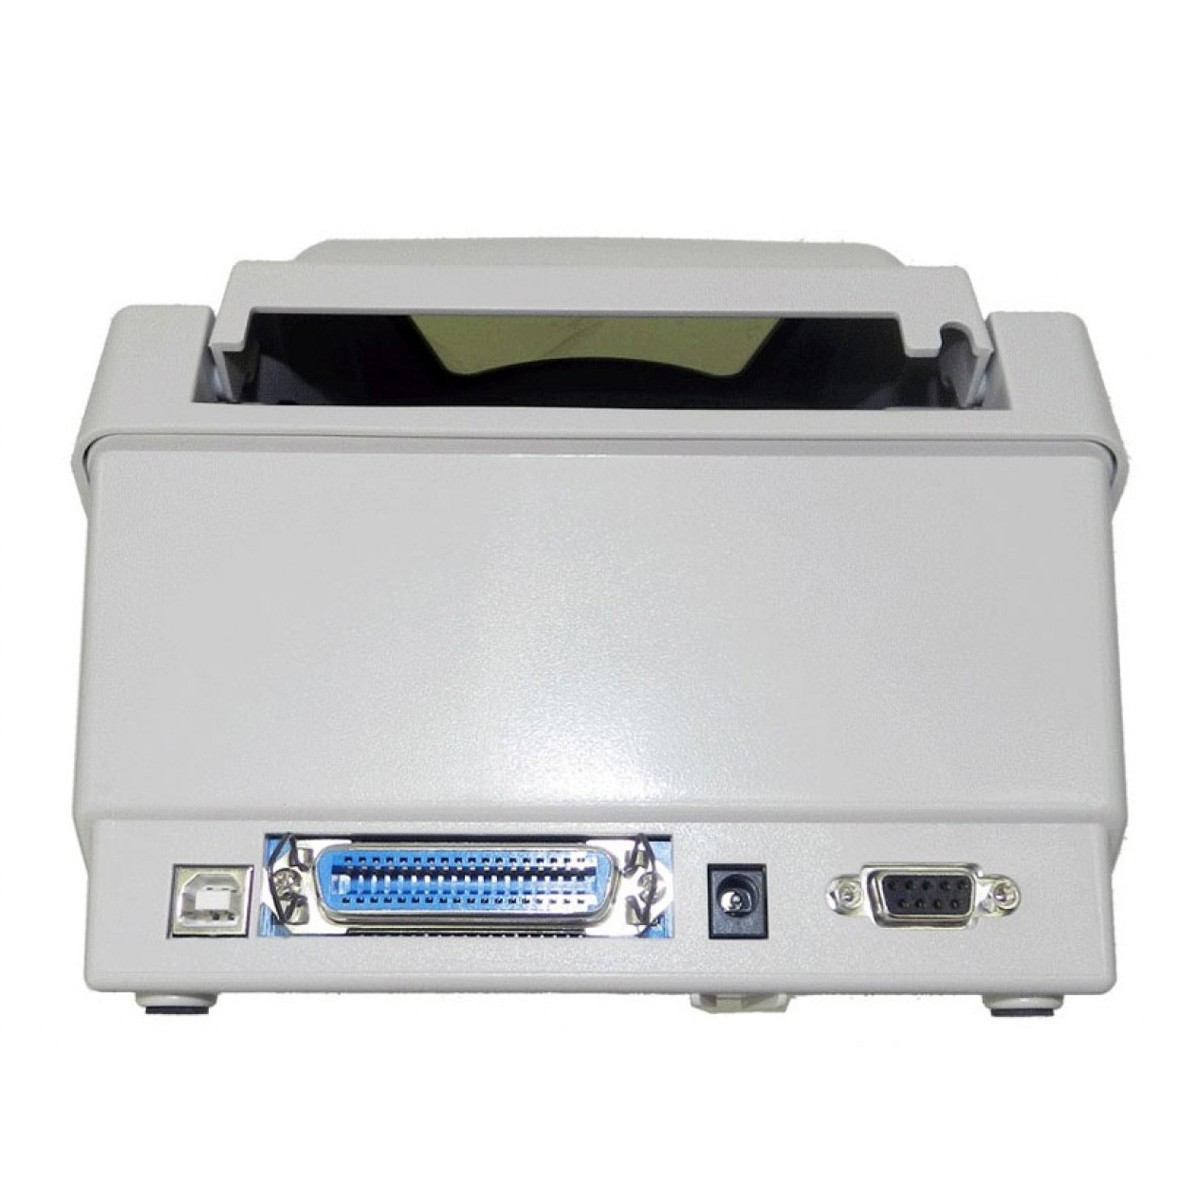 Impressora de Etiquetas Térmica OS-214 PLUS - Argox